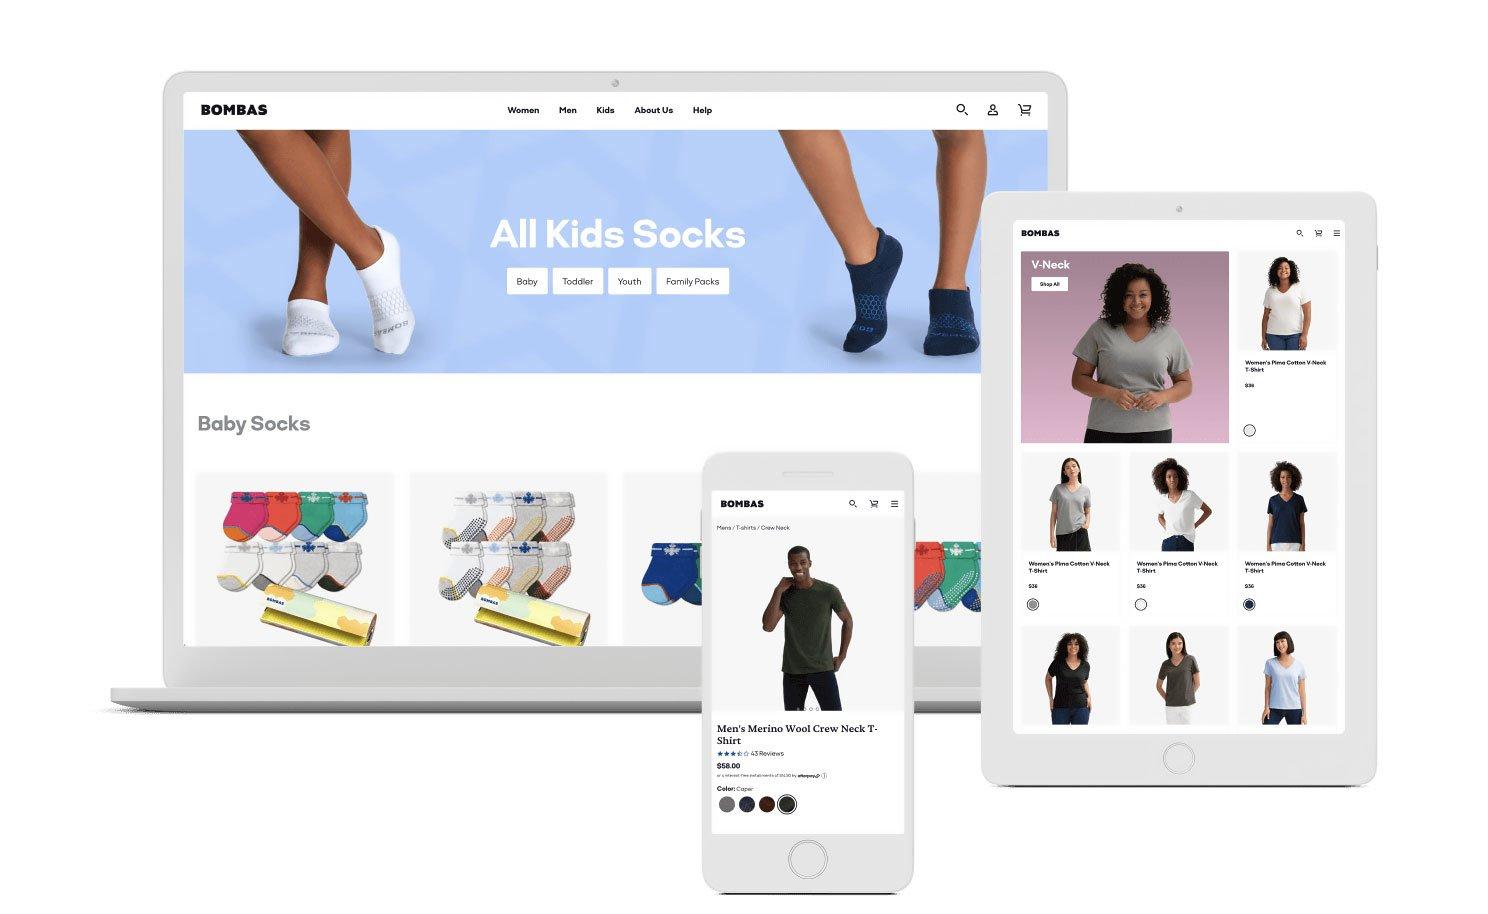 Shopify Partners Mockup Screenshot Showing Bombas Sock Website